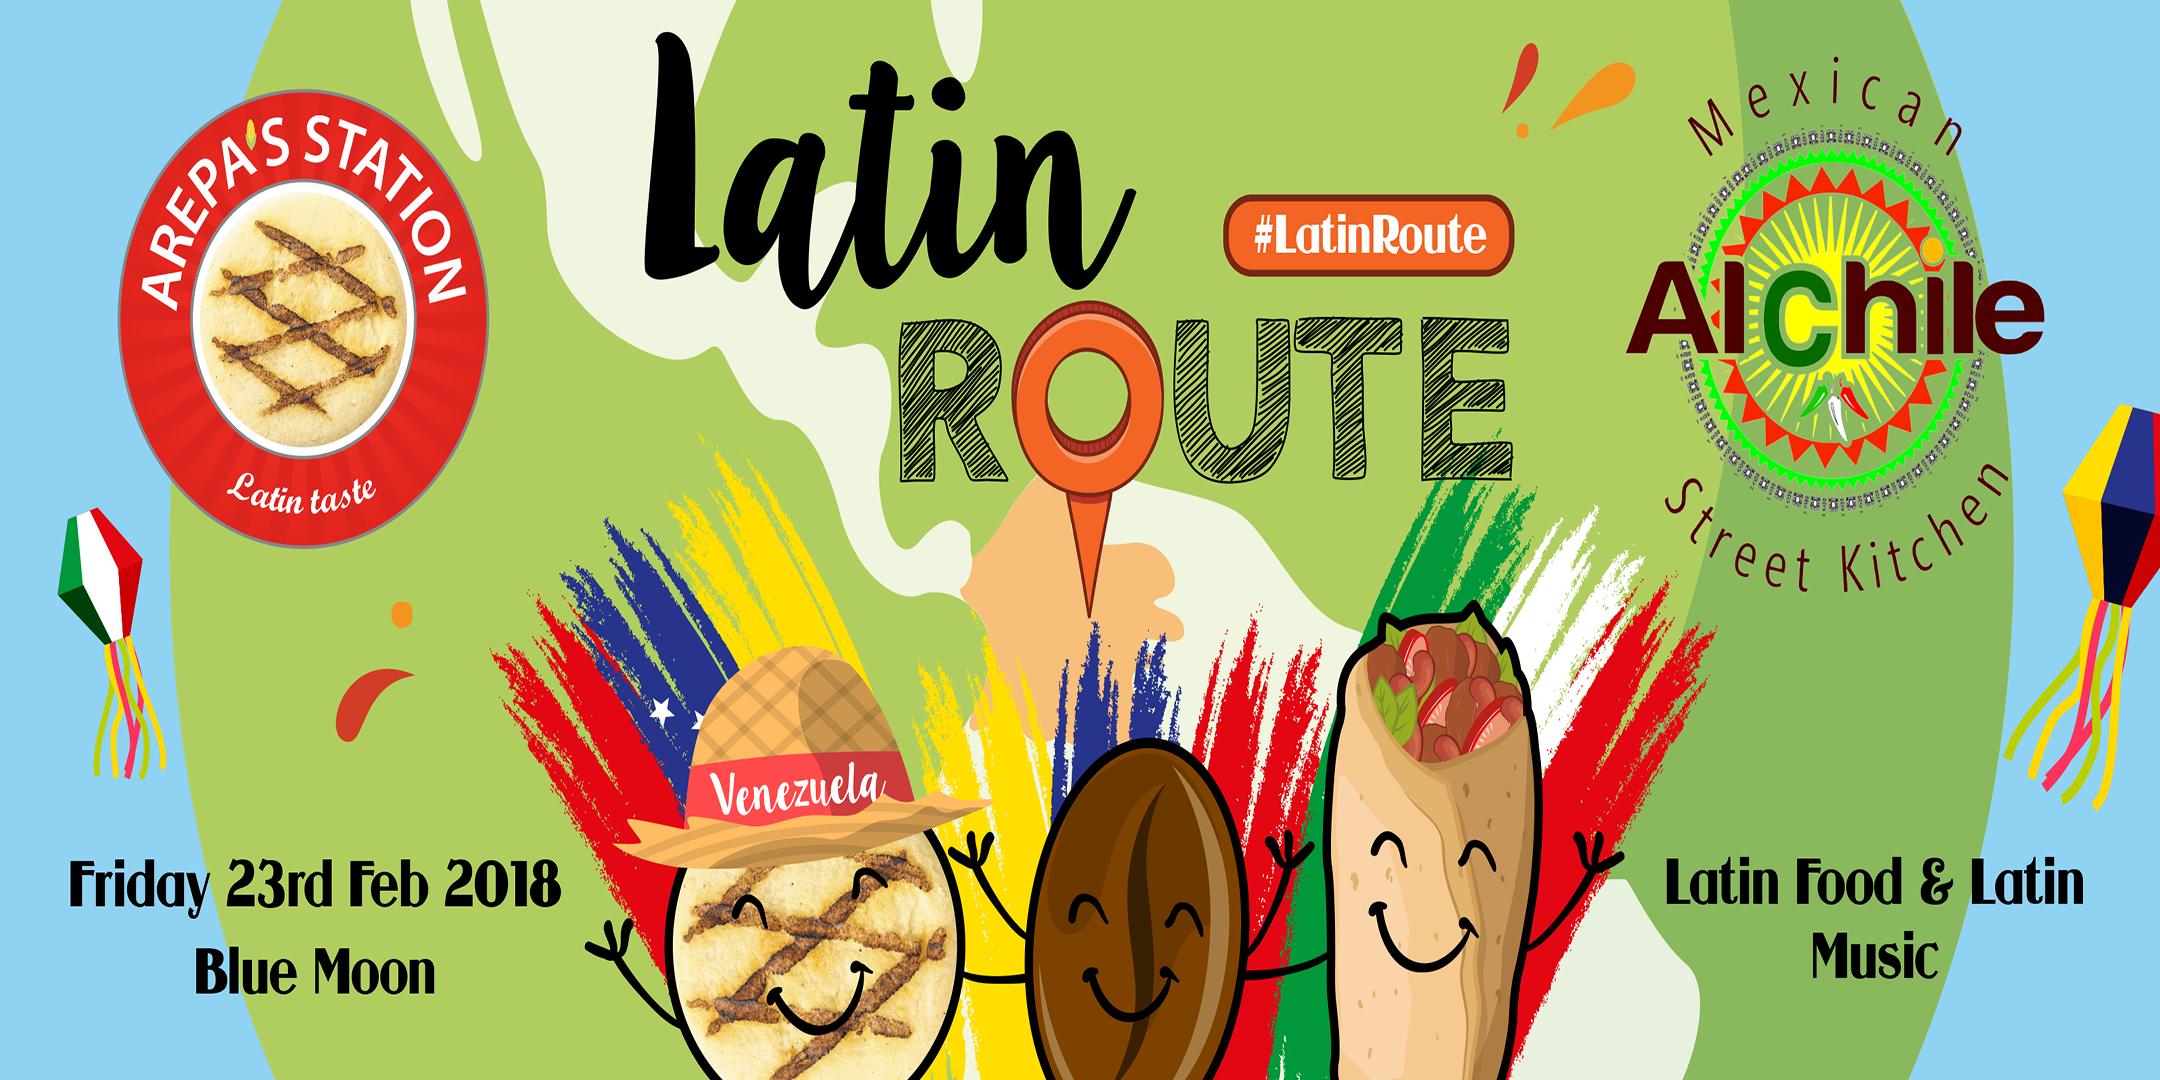 Latin Street Food Route + Music in Cambridge